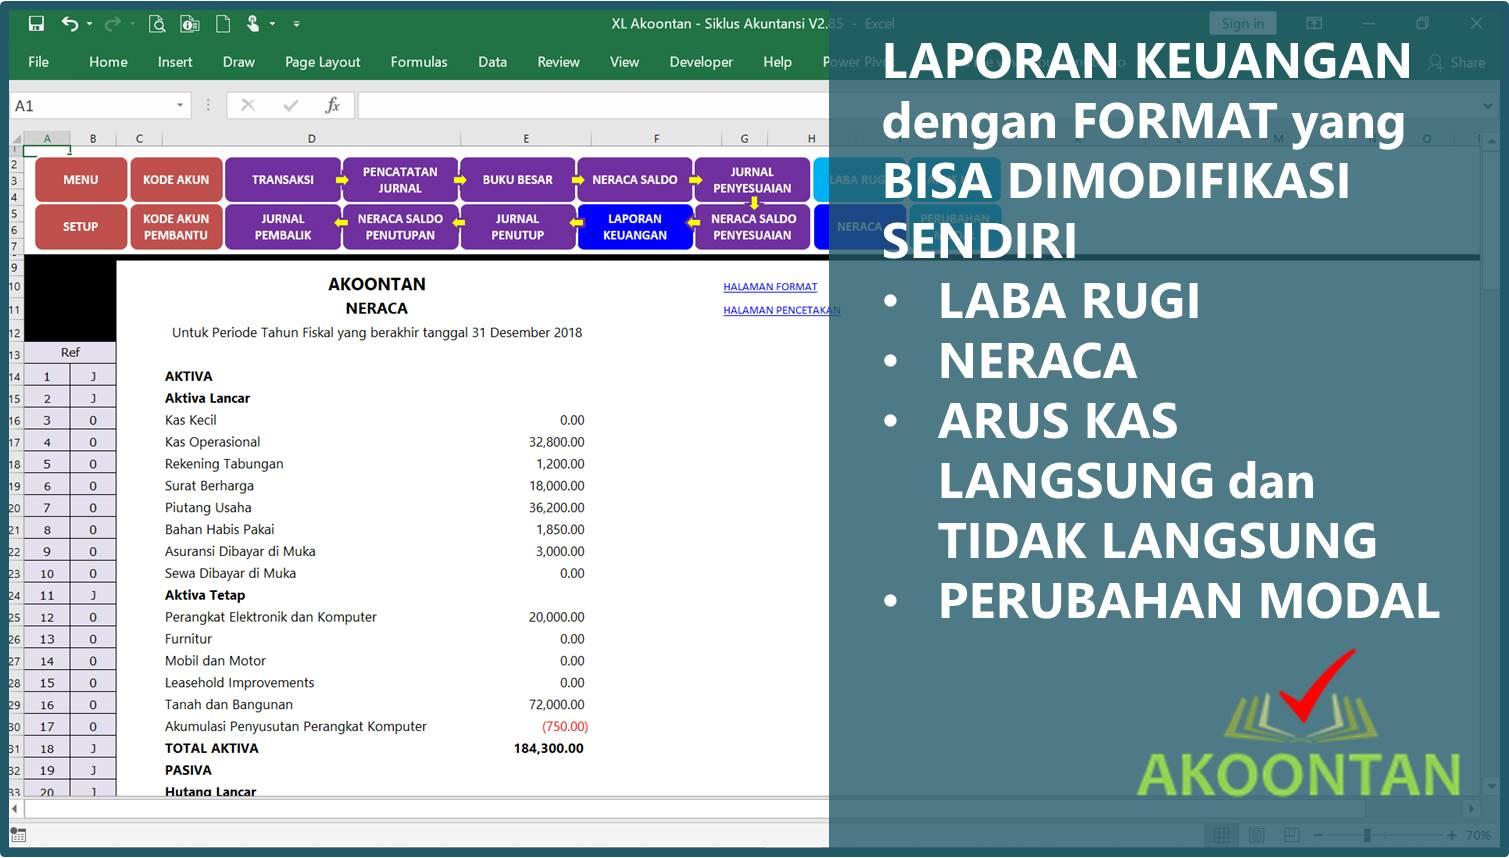 Akuntansi-ID - Excel Siklus Akuntansi - Laporan